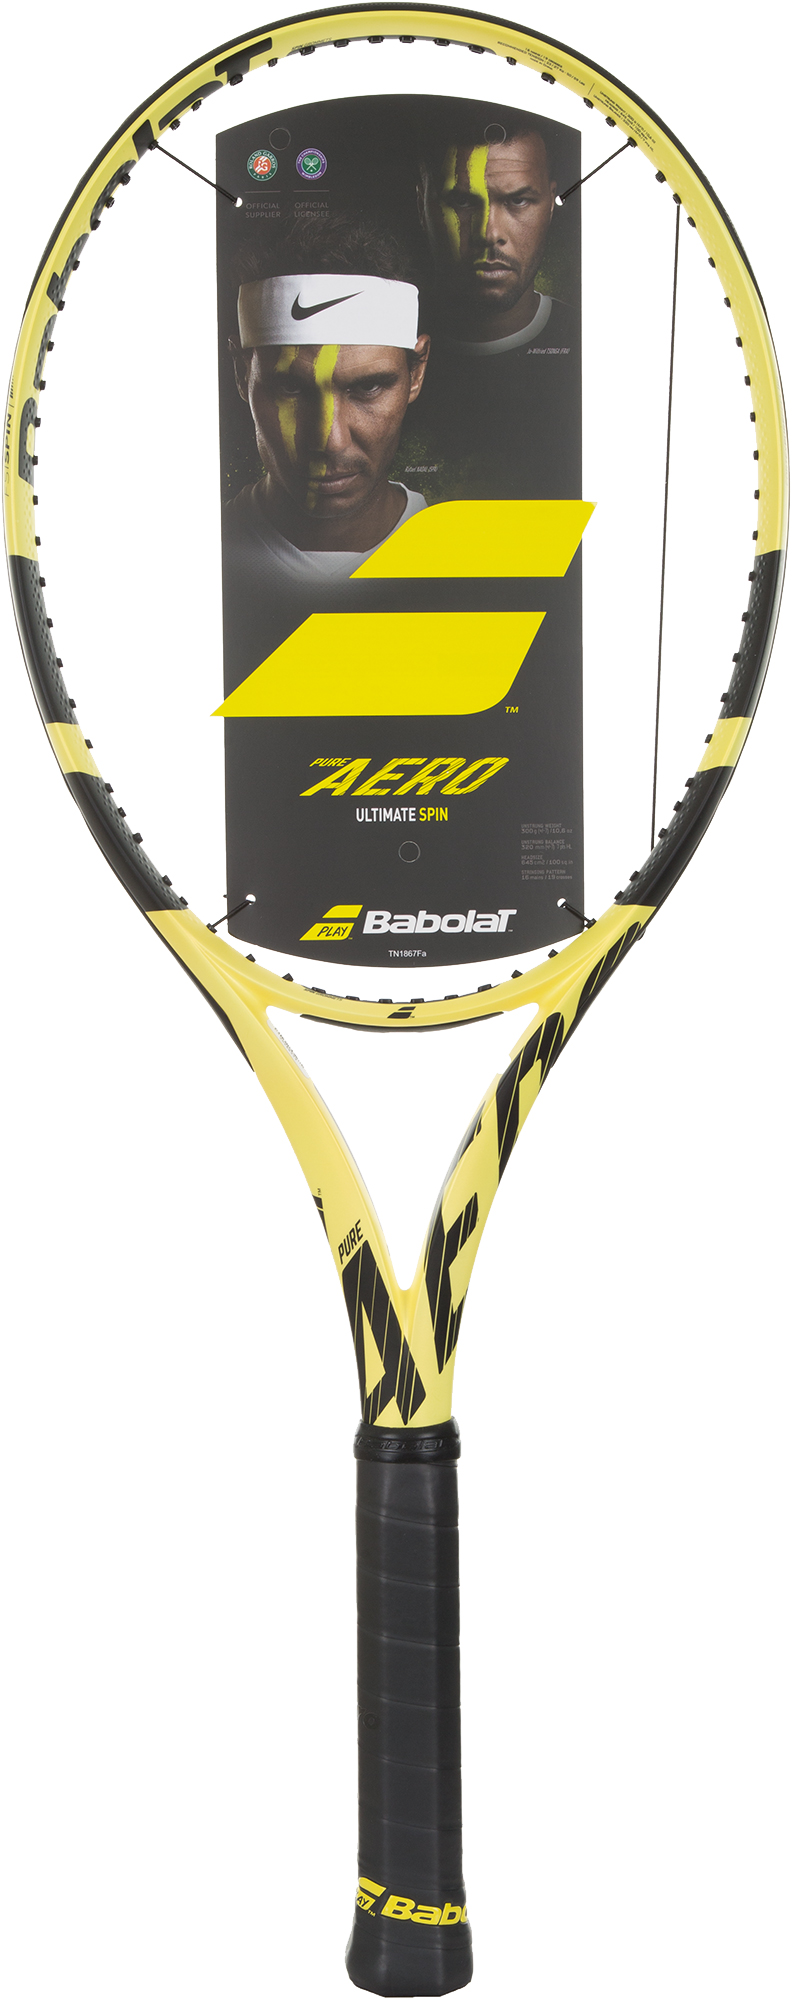 Babolat Ракетка для большого тенниса Babolat Pure Aero, размер 4 babolat ракетка для большого тенниса детская babolat ballfighter 19 размер без размера